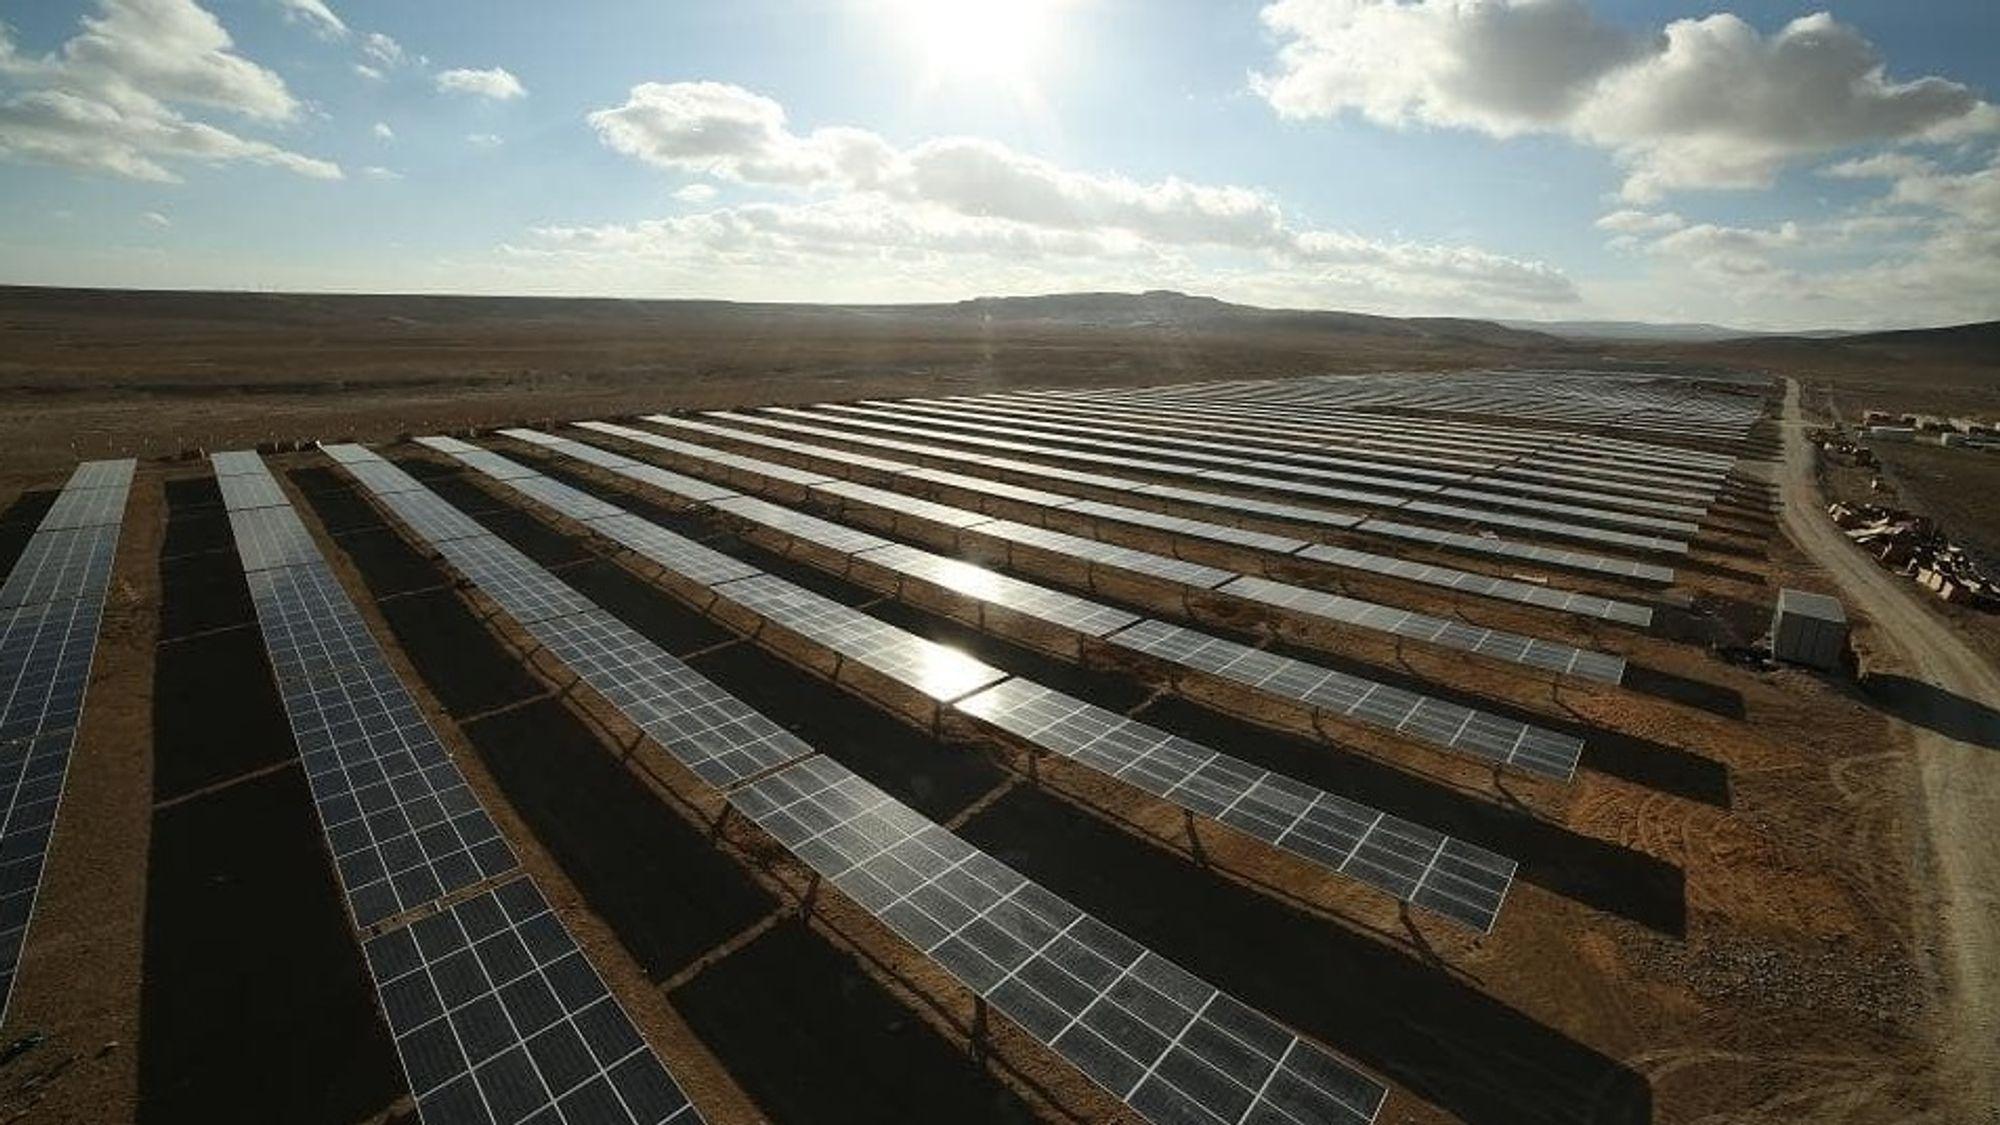 Scatec Solars Oryx solpark på 10 MW i Jordan åpnet i 2016.